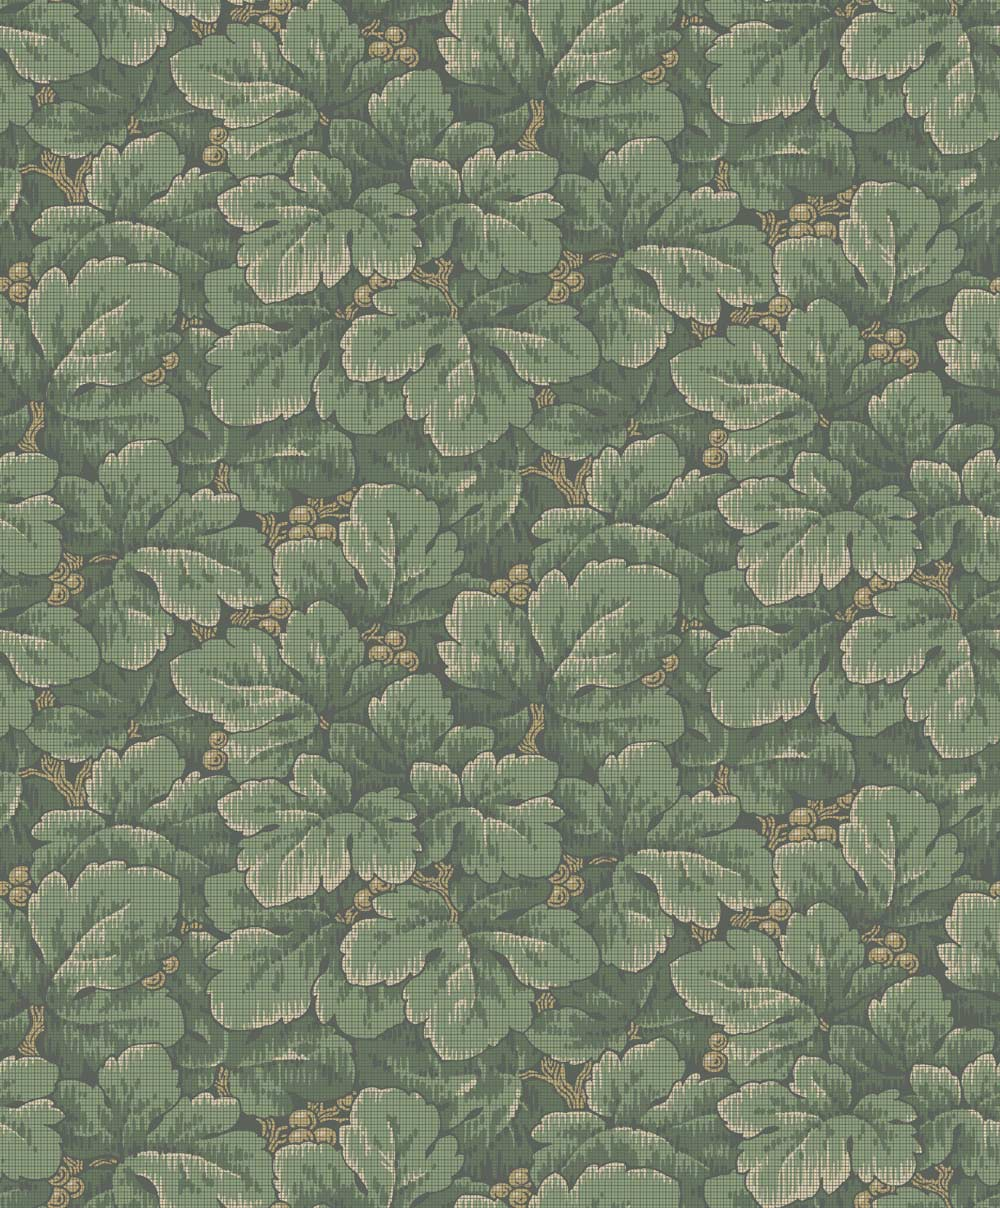 Boråstapeter Waldemar Green Wallpaper - Product code: 4544